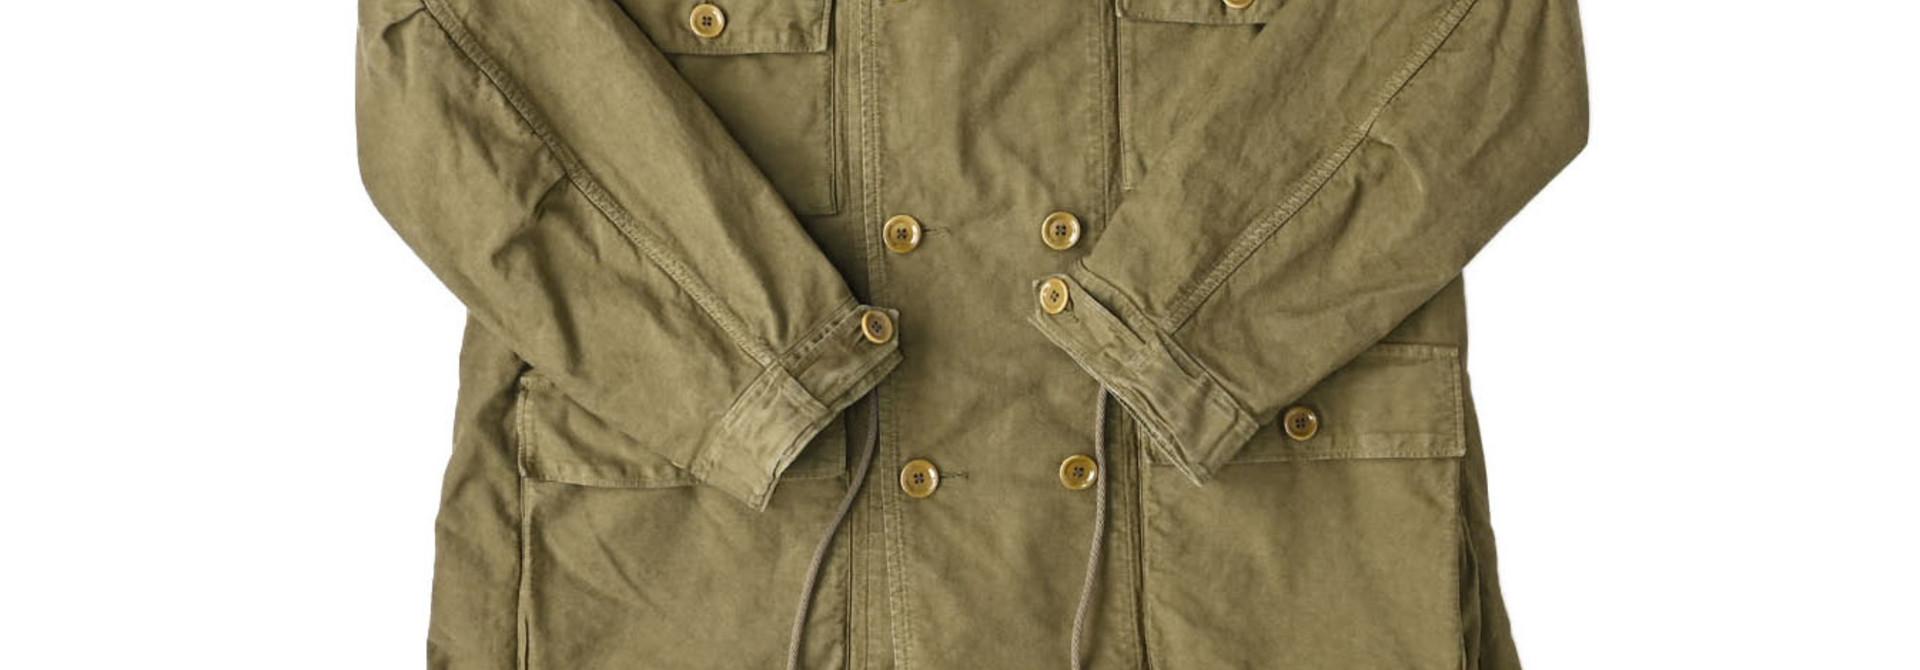 Okome Sateenn UMII Mods Coat